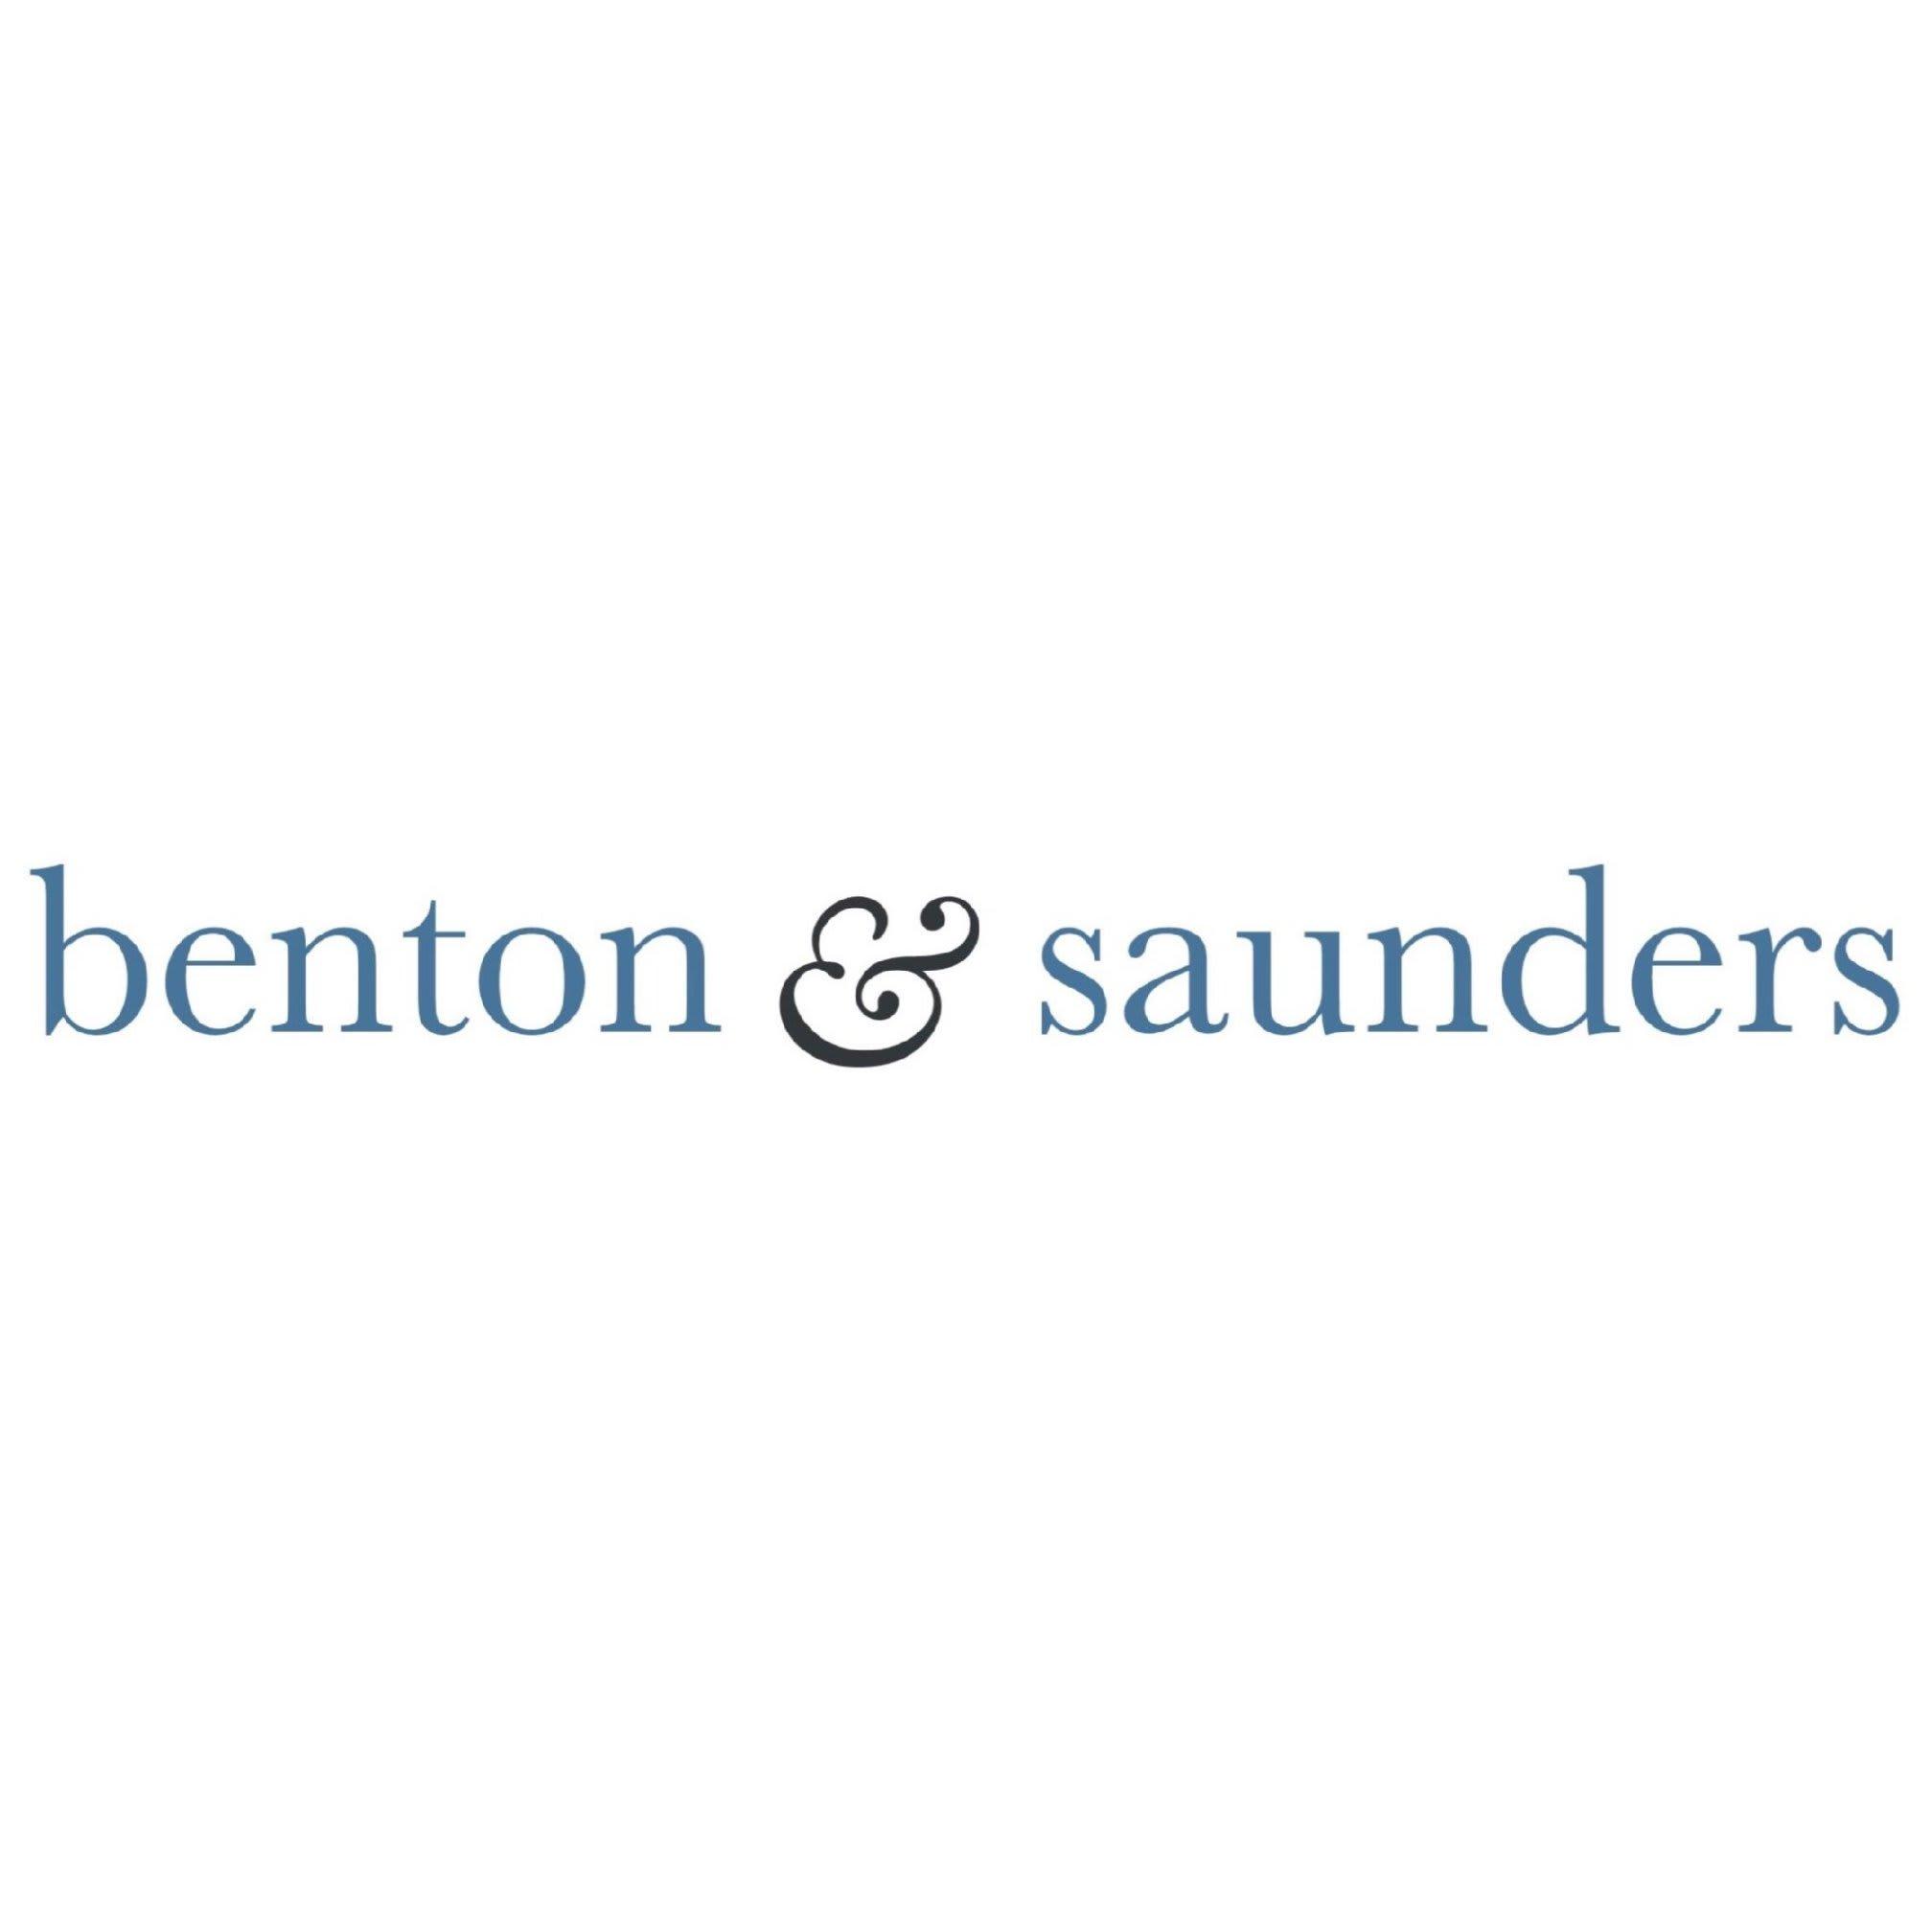 Benton & Saunders Ltd - Leamington Spa, Warwickshire CV32 4LY - 01926 830035 | ShowMeLocal.com